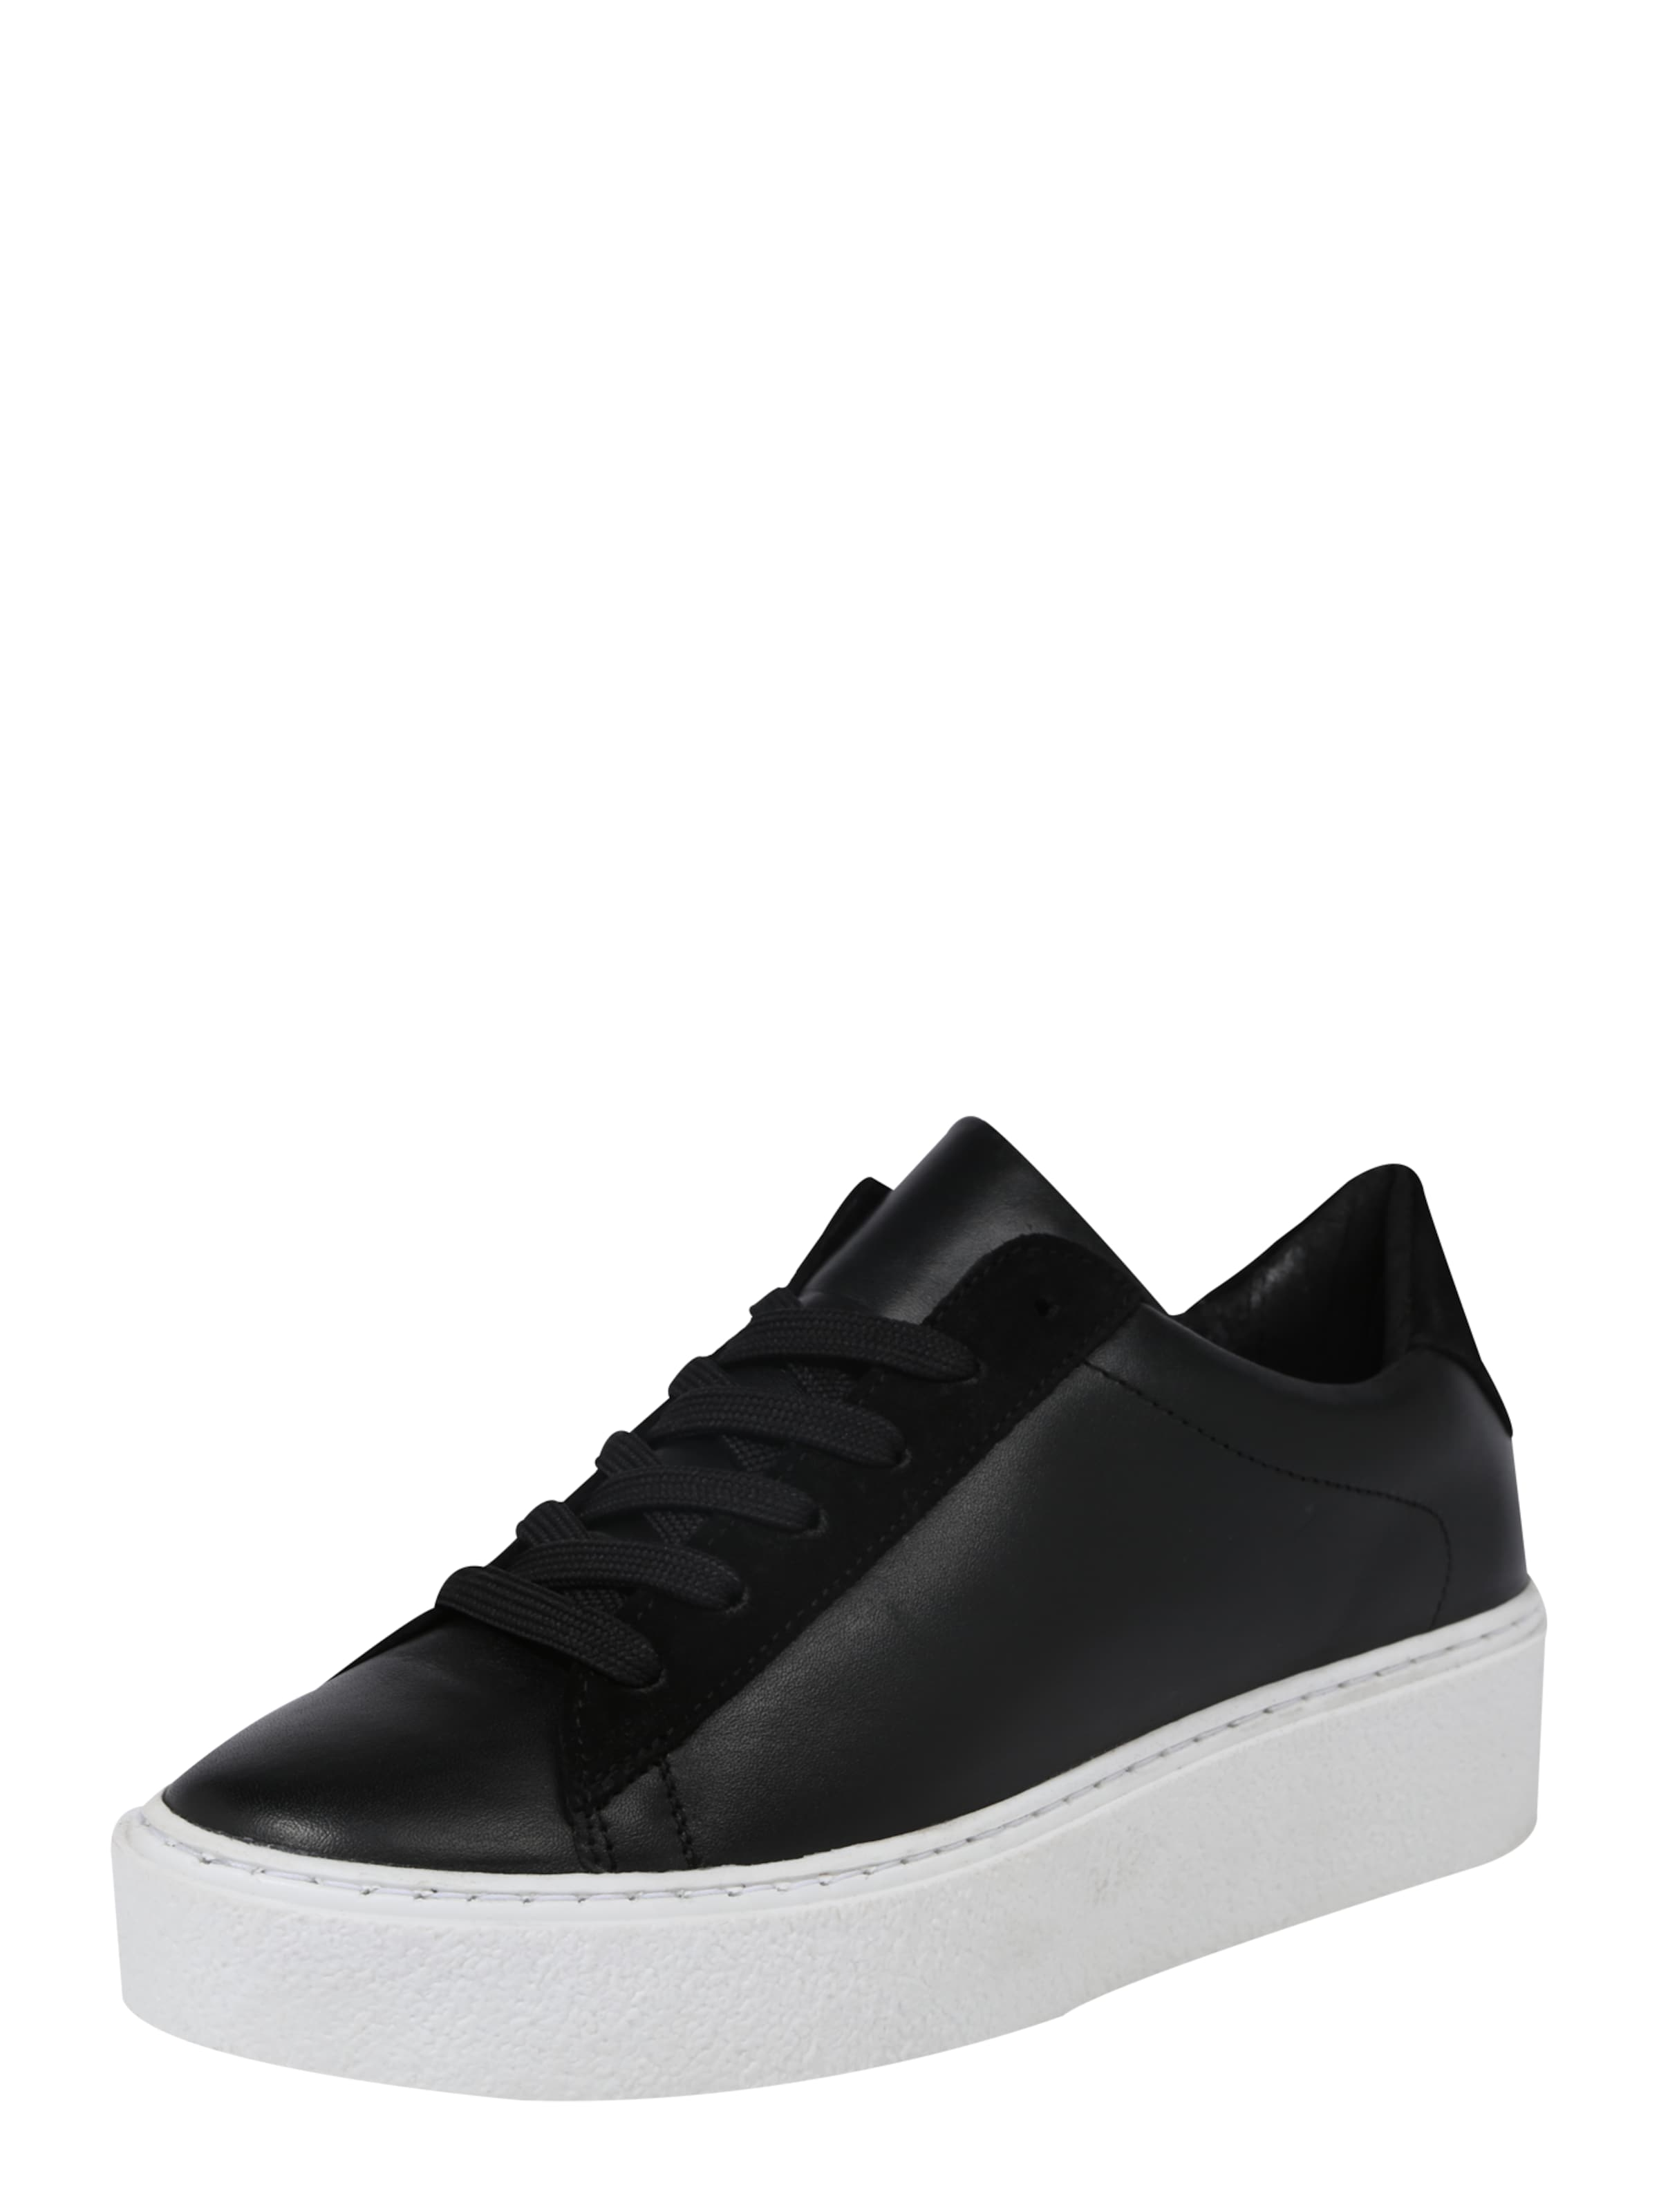 Zign Sneaker mit Plateausohle Verschleißfeste billige Schuhe